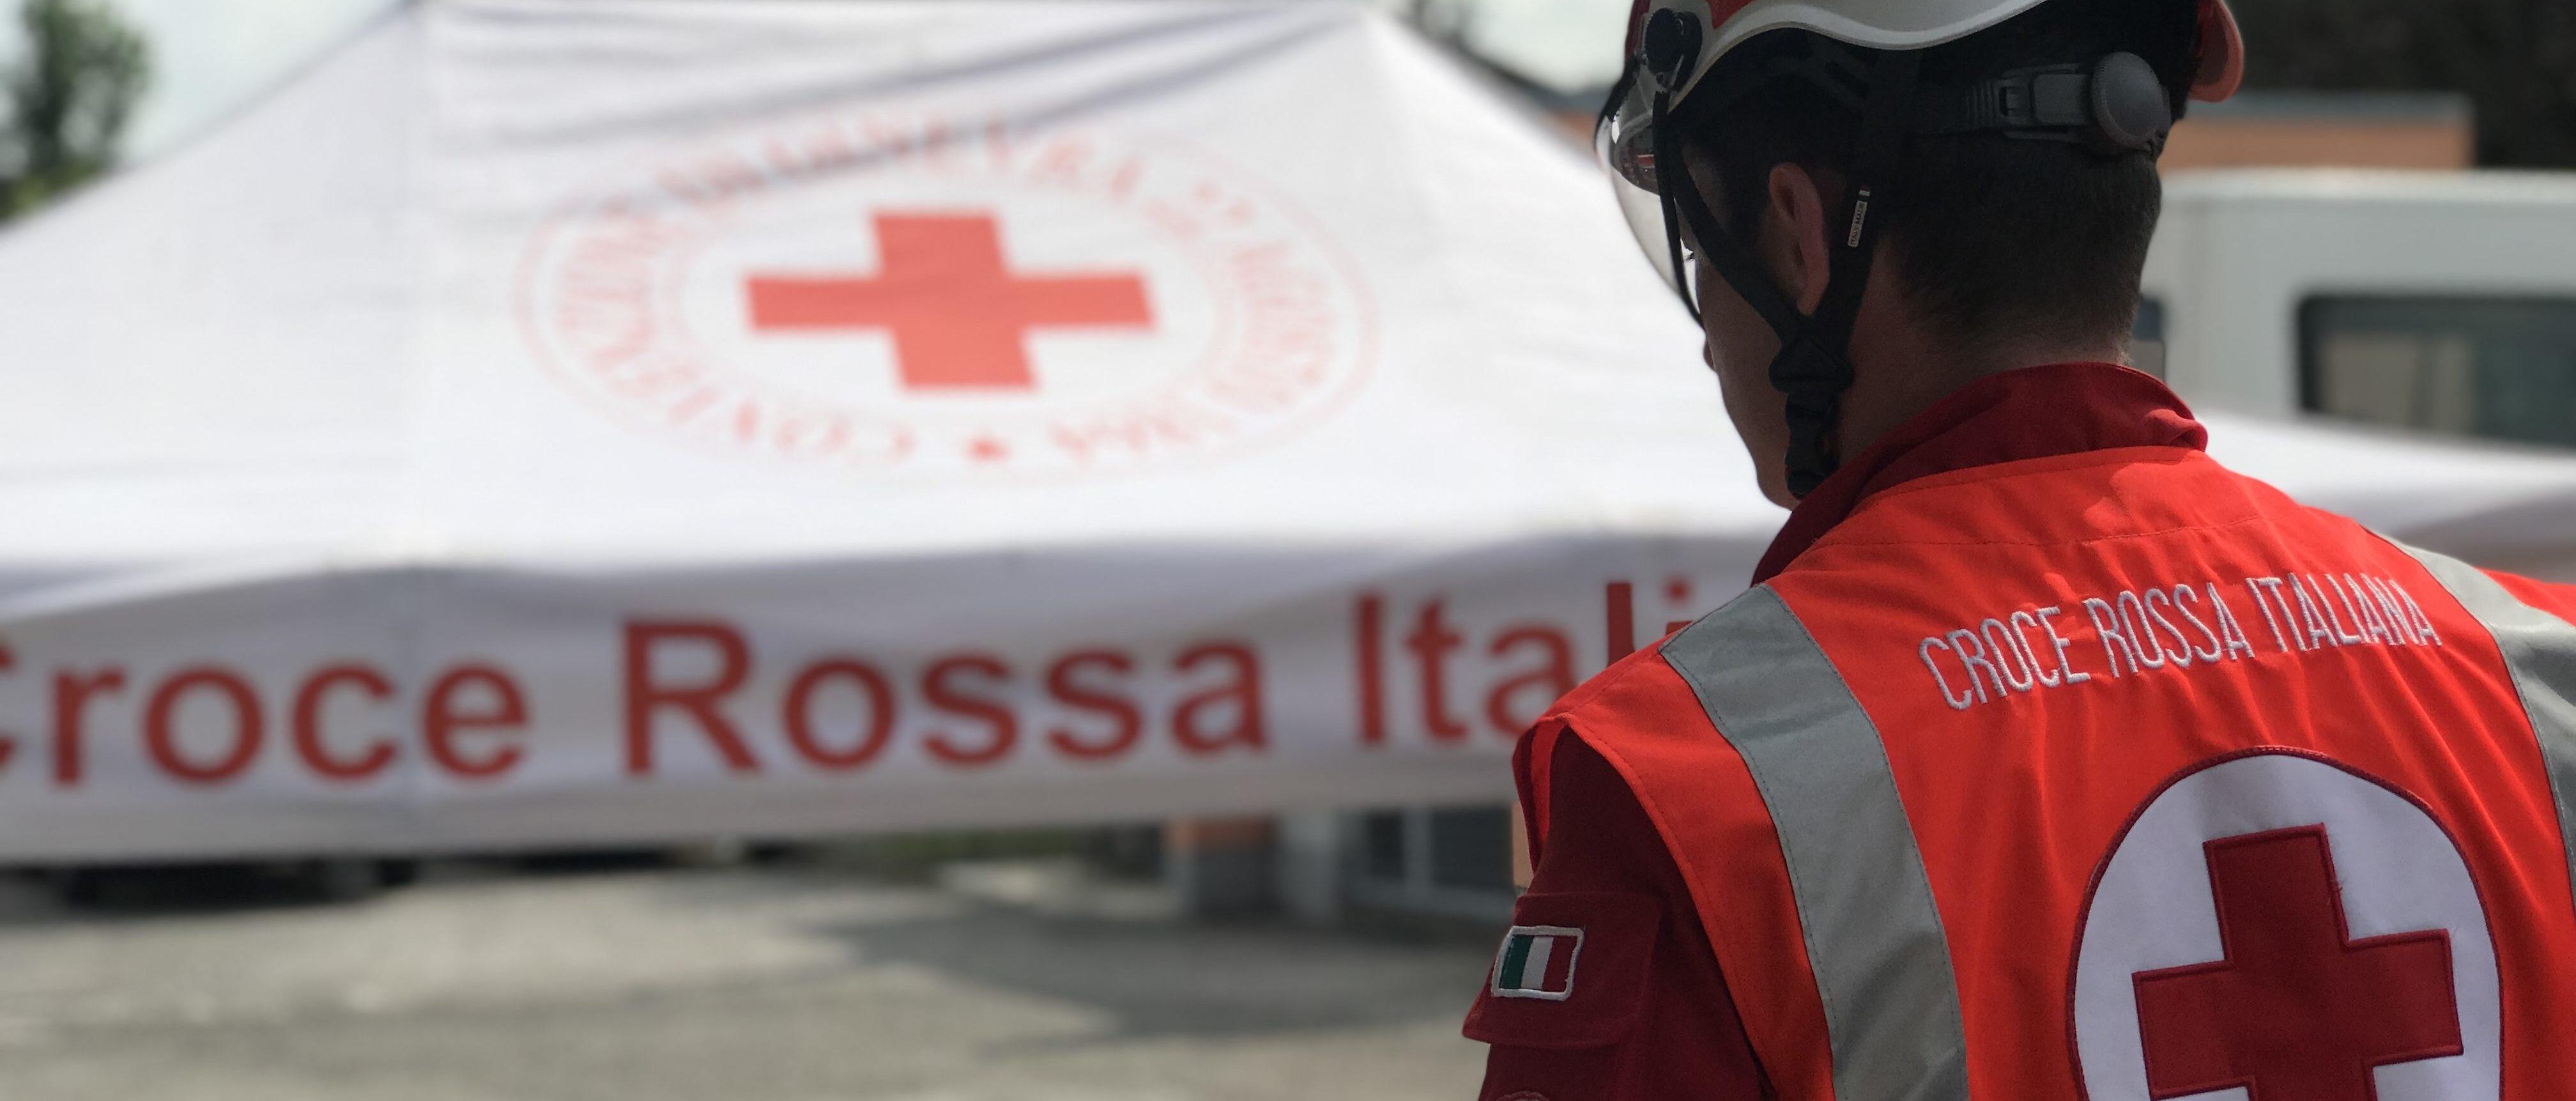 Croce Rossa Italiana Storia